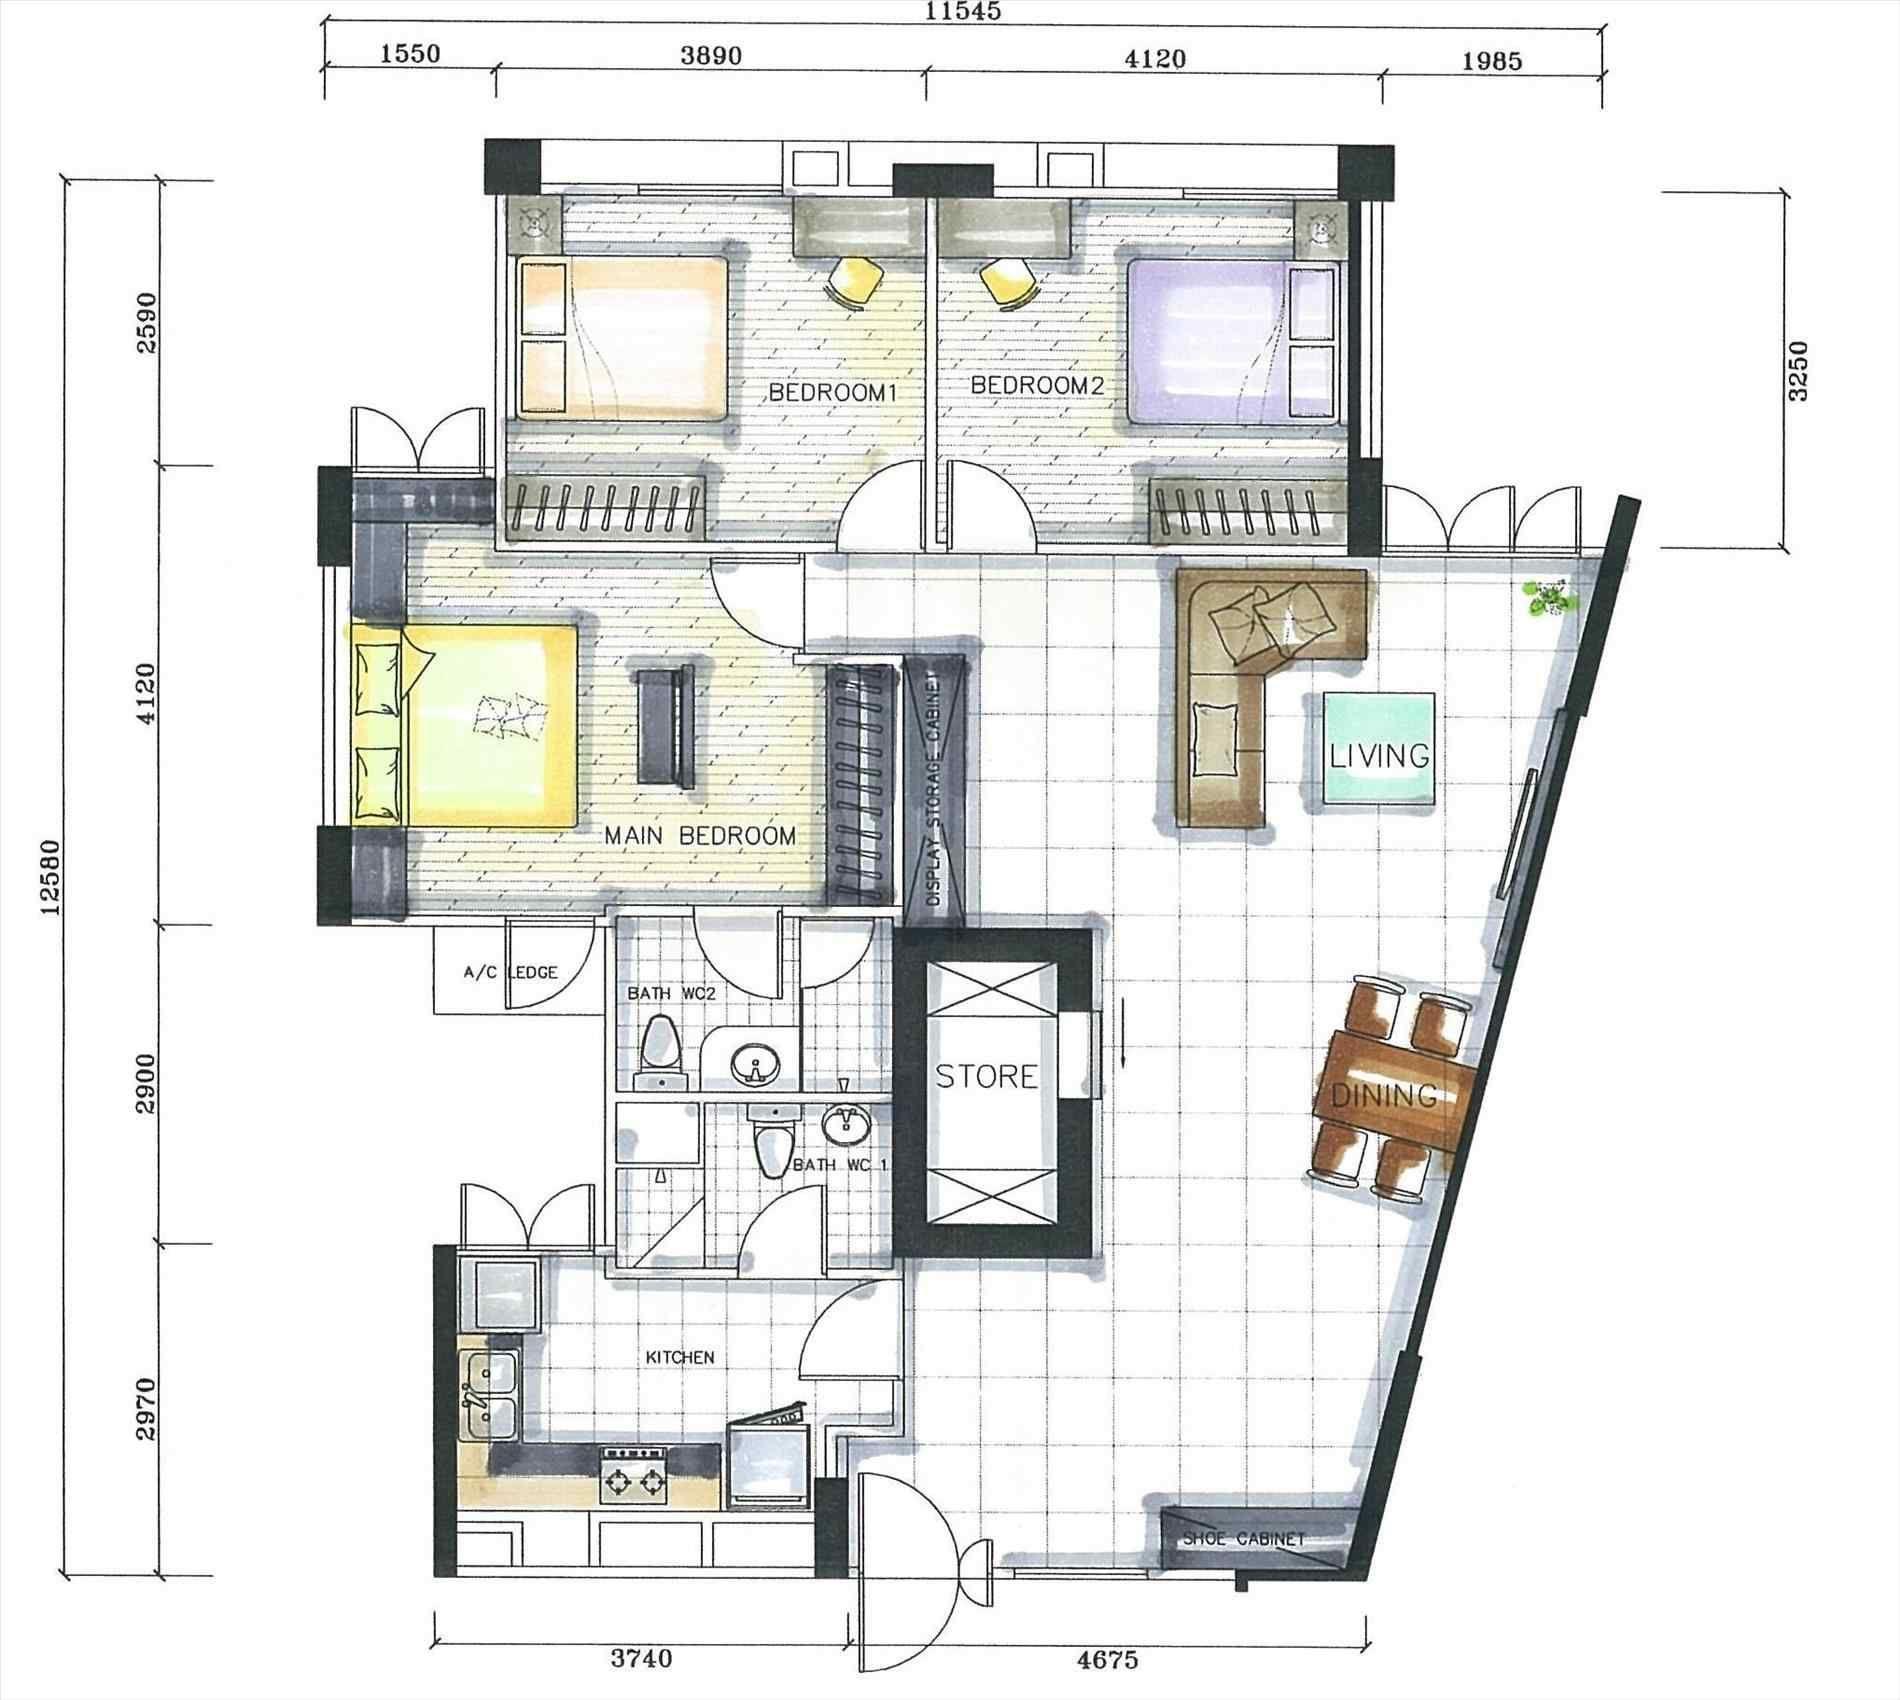 Bedroom Layout Design Fair Pinsherry Jwilliams On Modern Master Bedroom Layout 2018